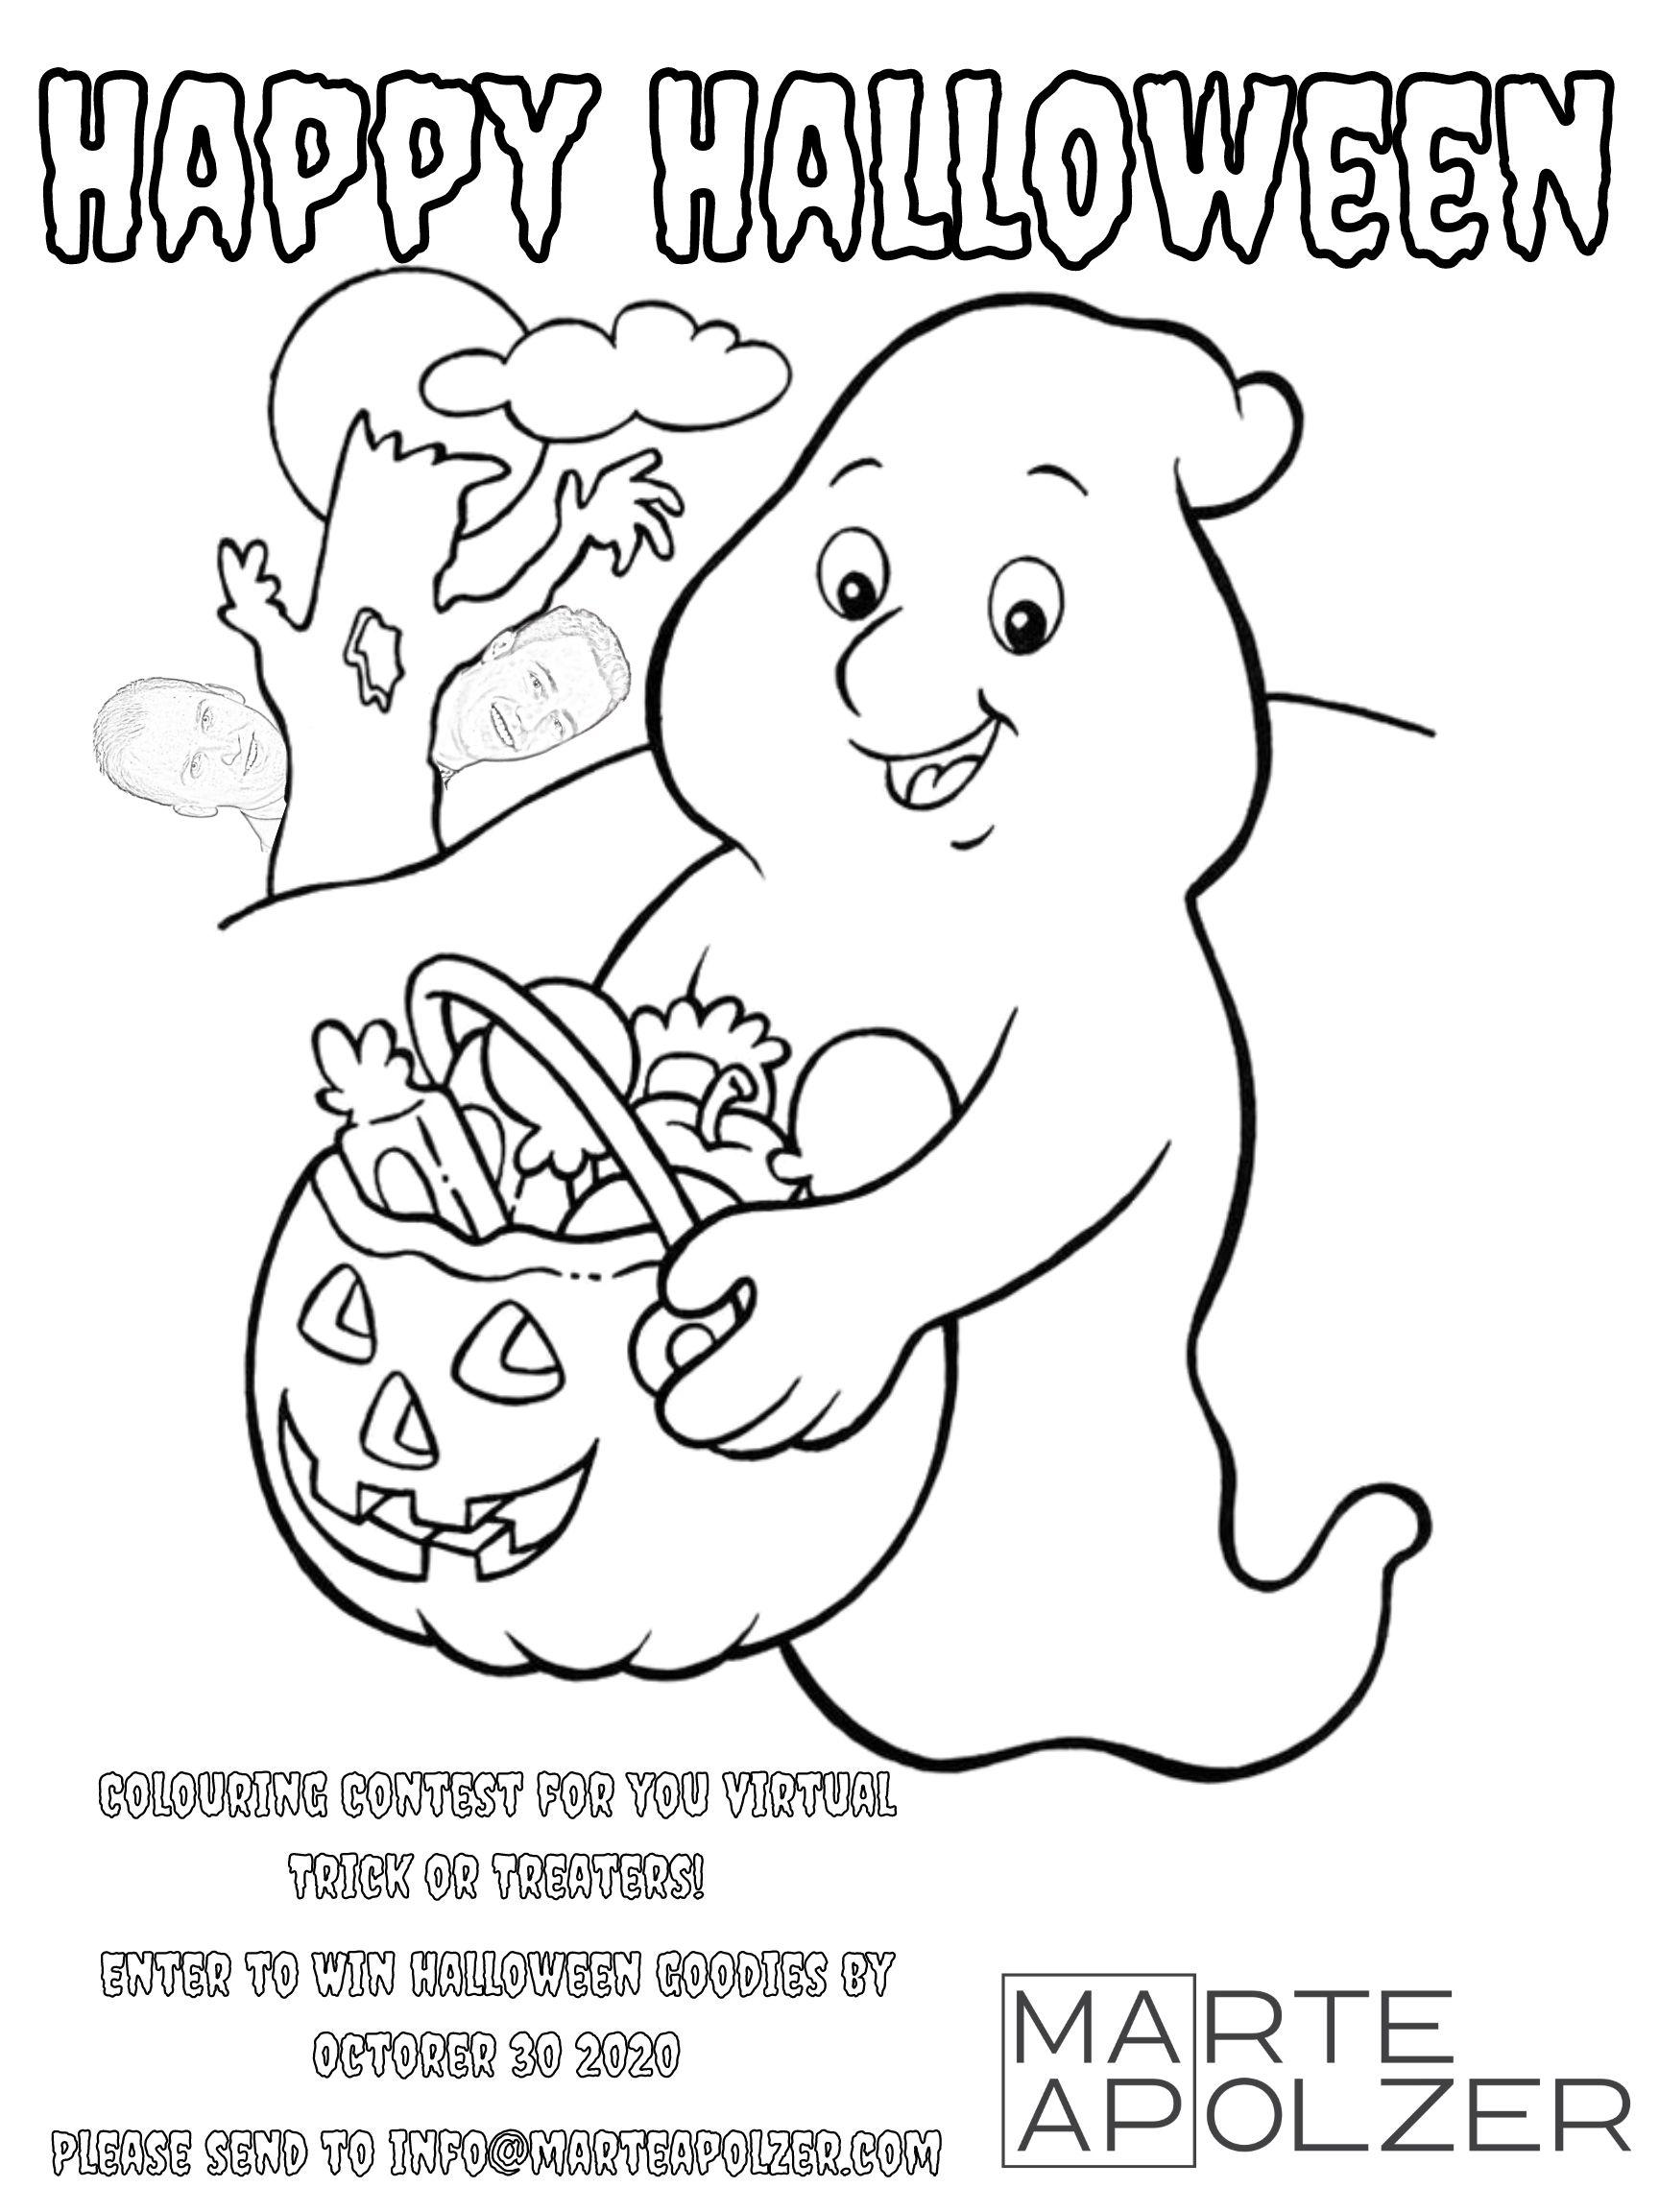 Happy Halloween – Colouring Contest